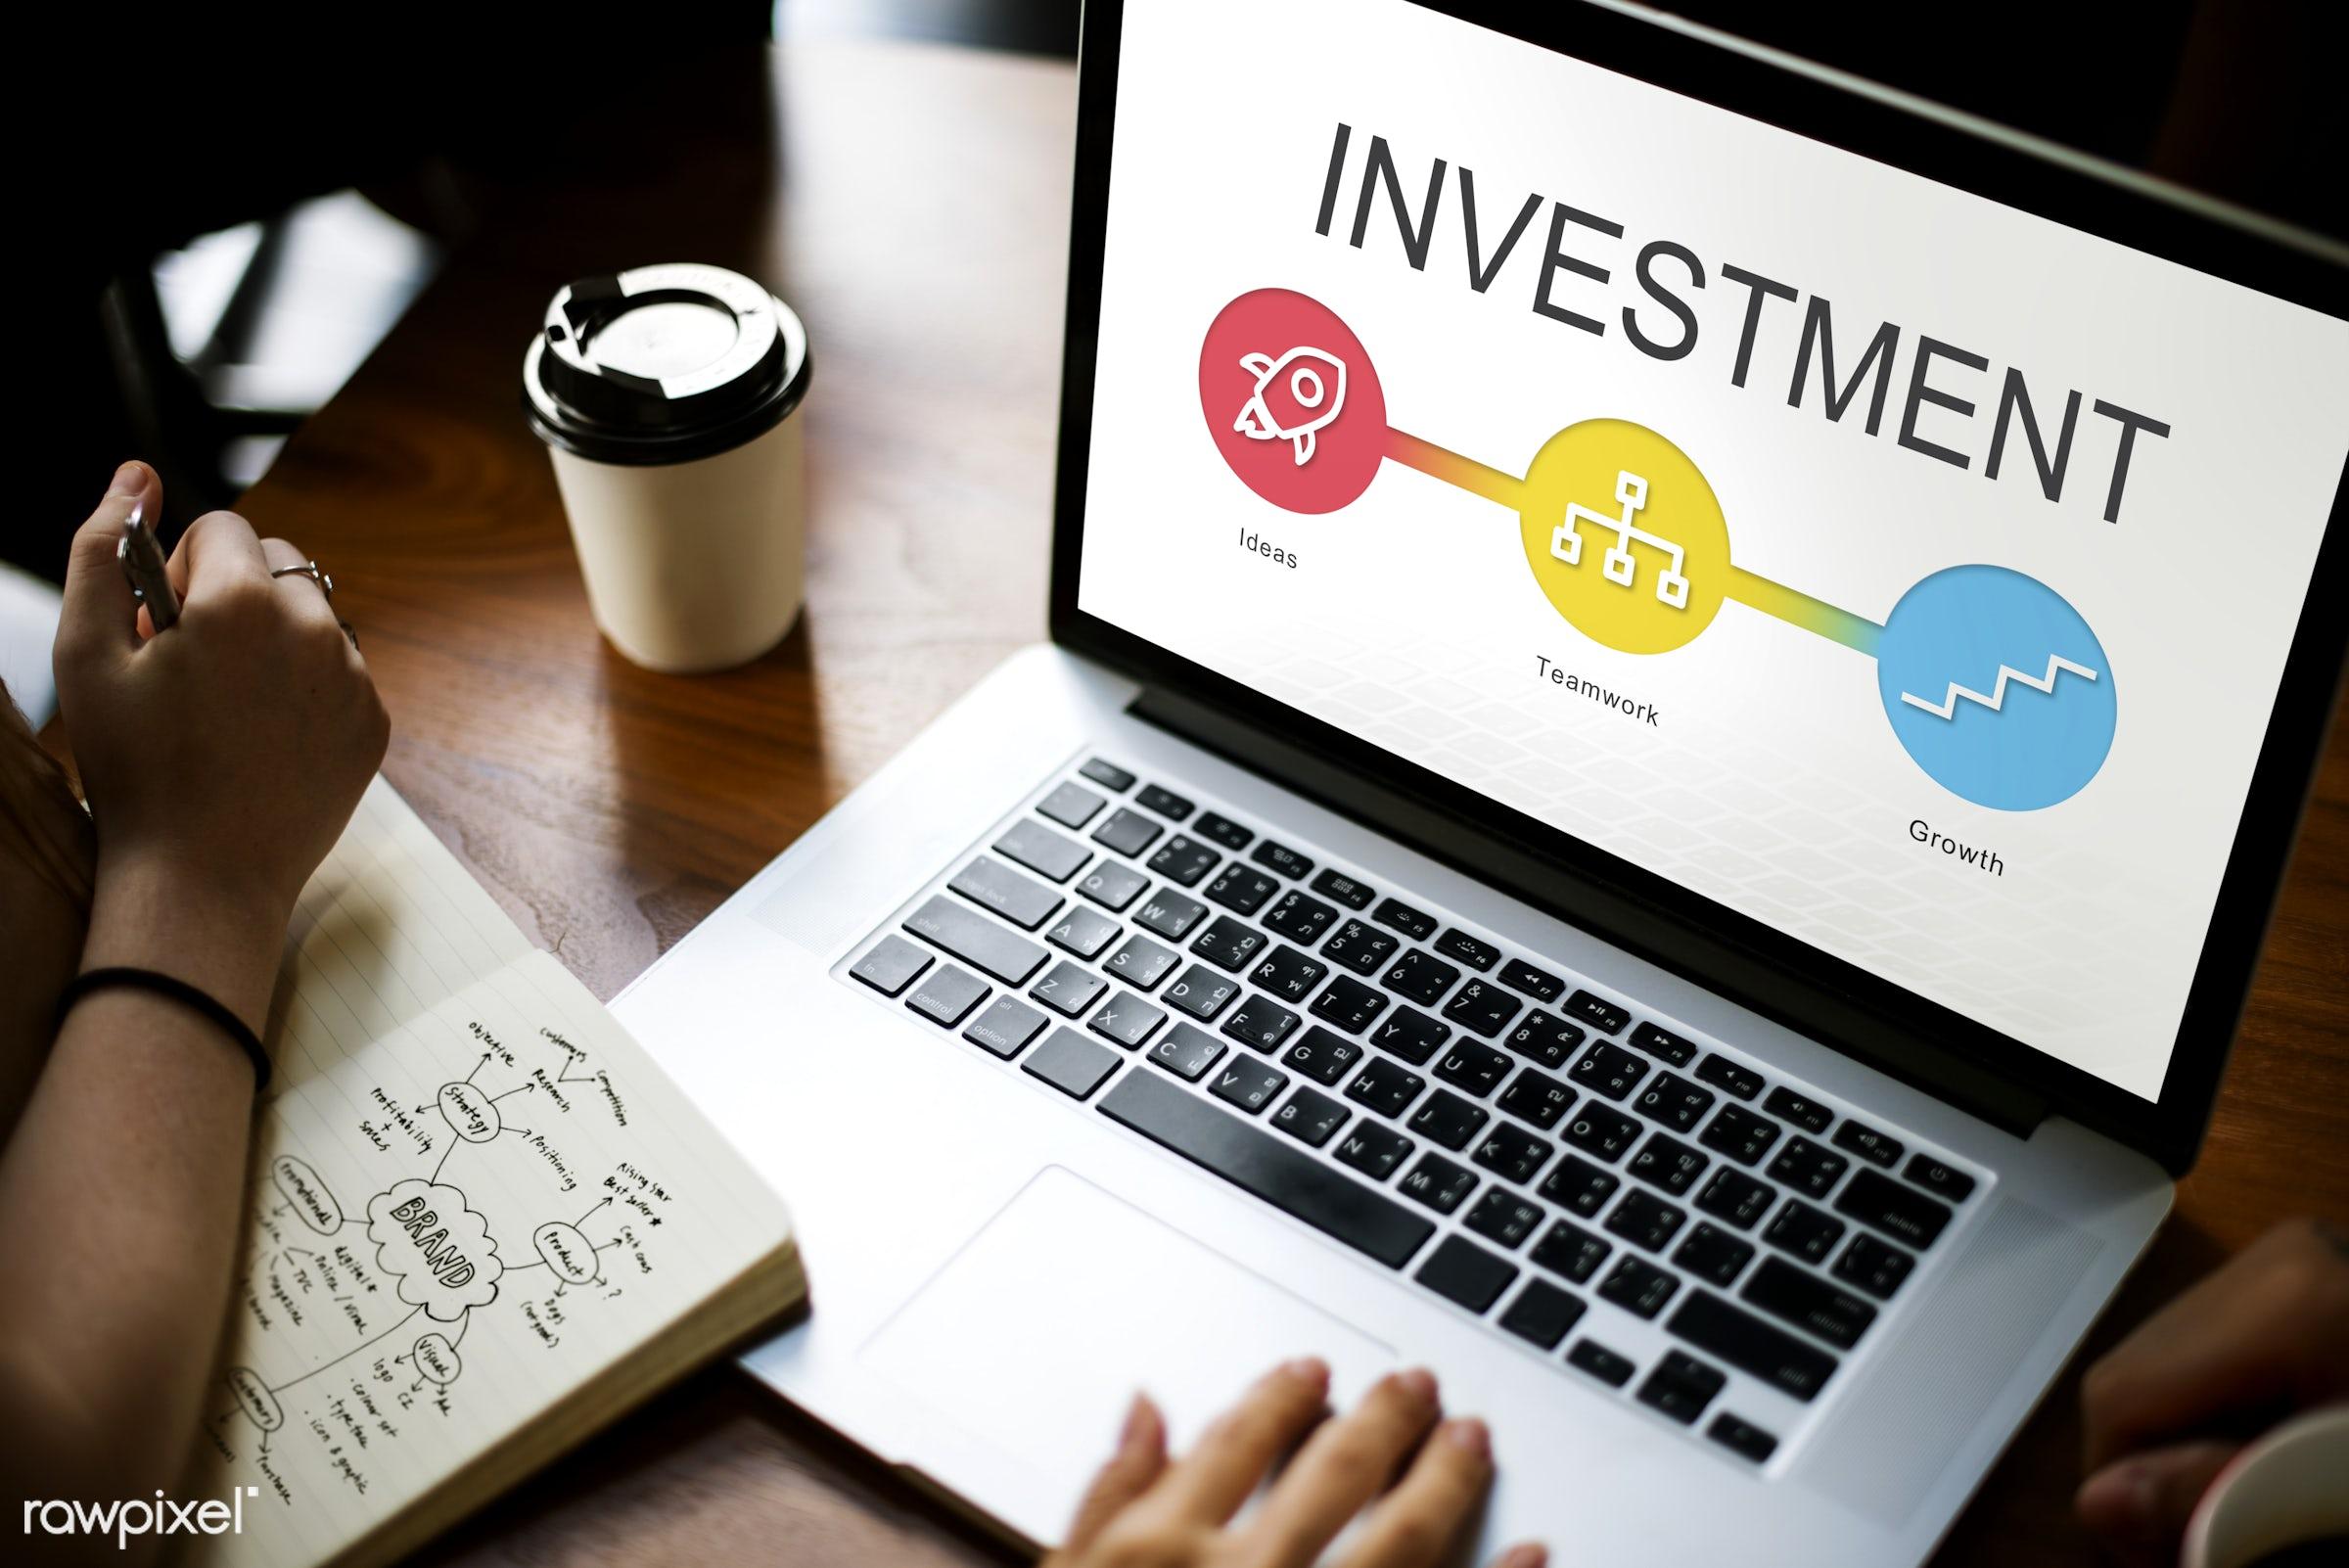 rocket, browsing, business, capital, coffee cup, development, device, digital, digital device, entrepreneur, execution,...